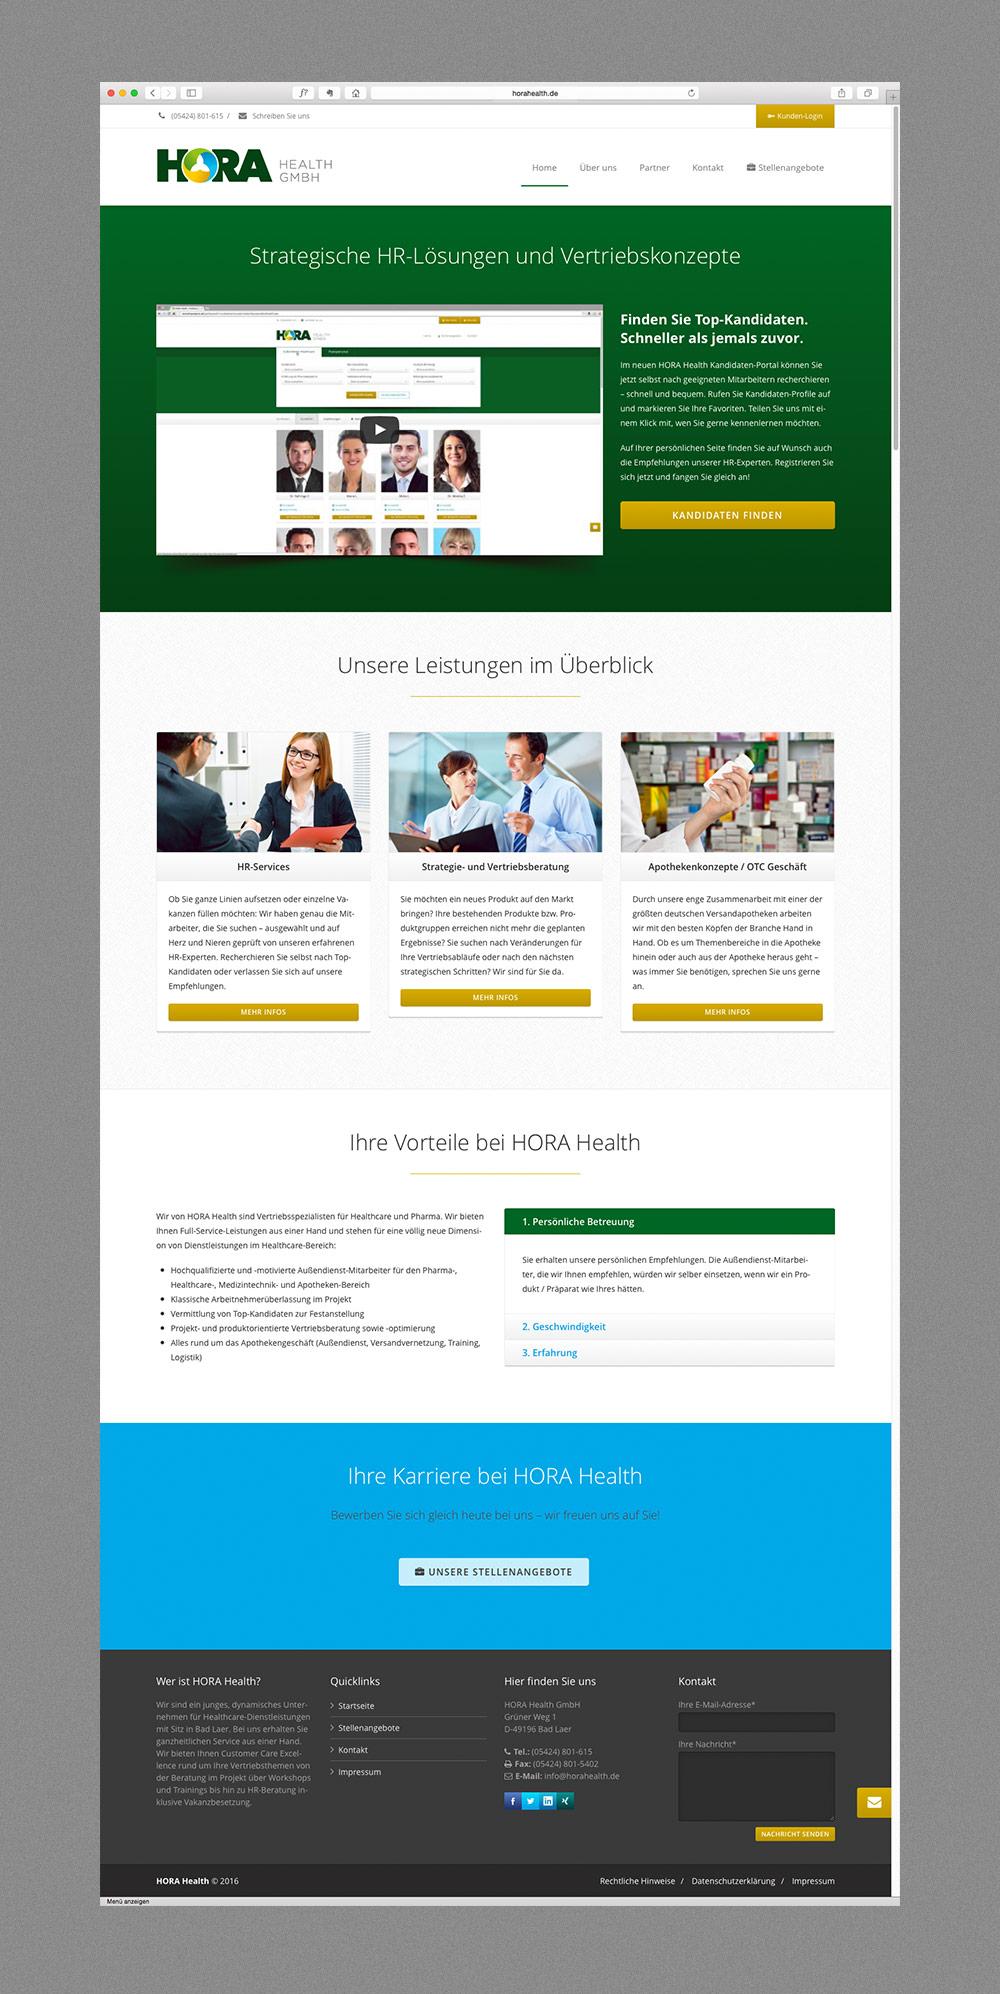 Online recruitment portal